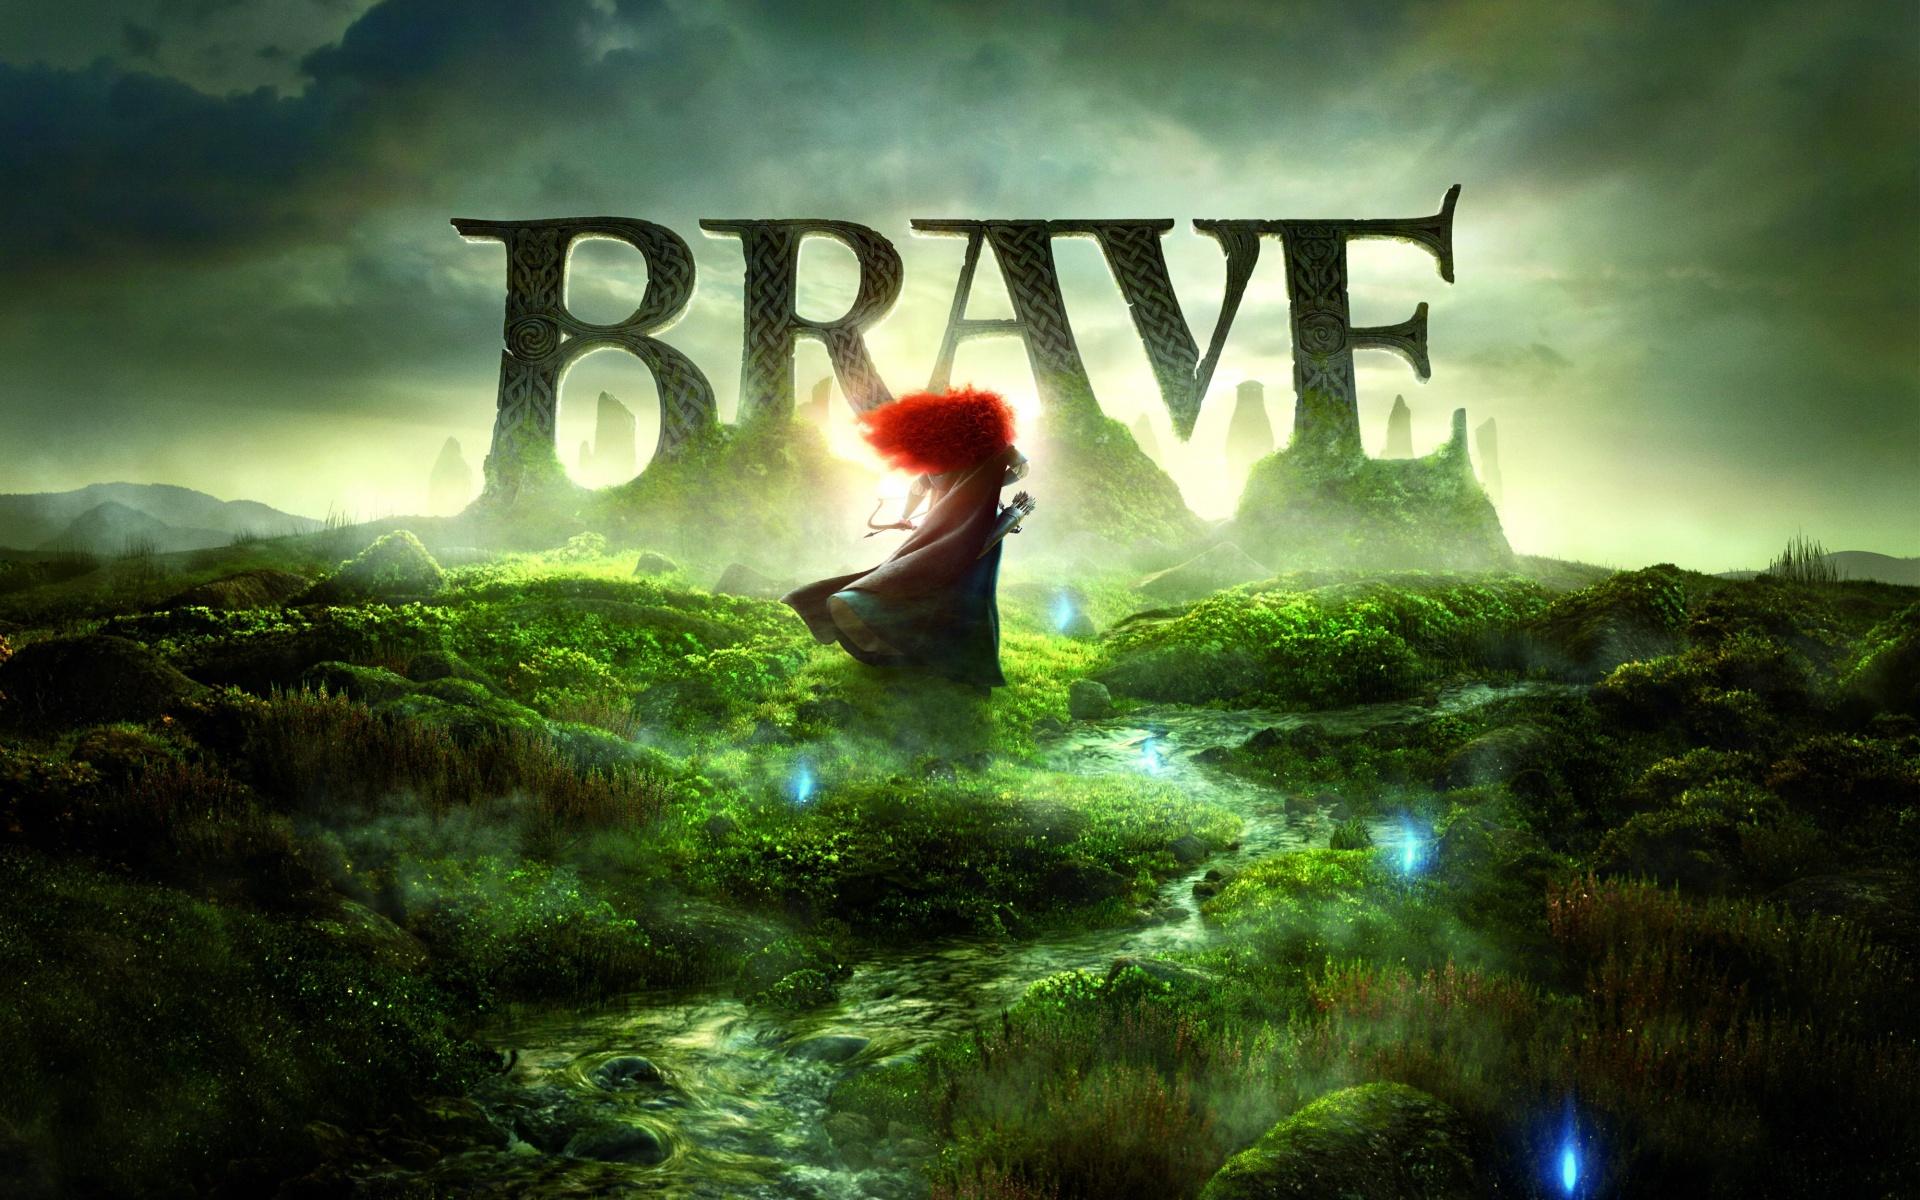 brave_movie_2012-1920x1200